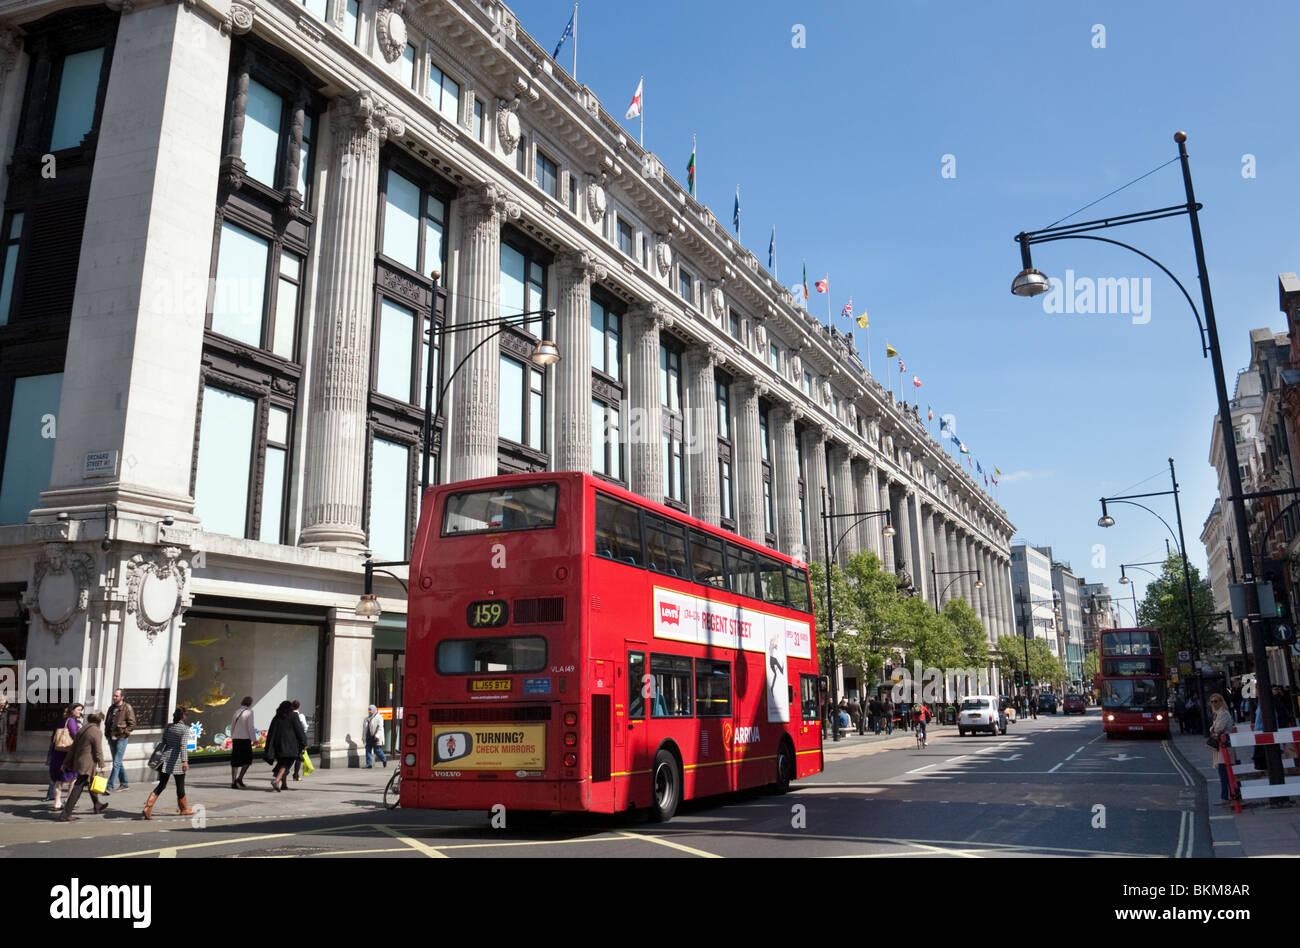 Buses outside Selfridges store, Oxford Street, London UK - Stock Image